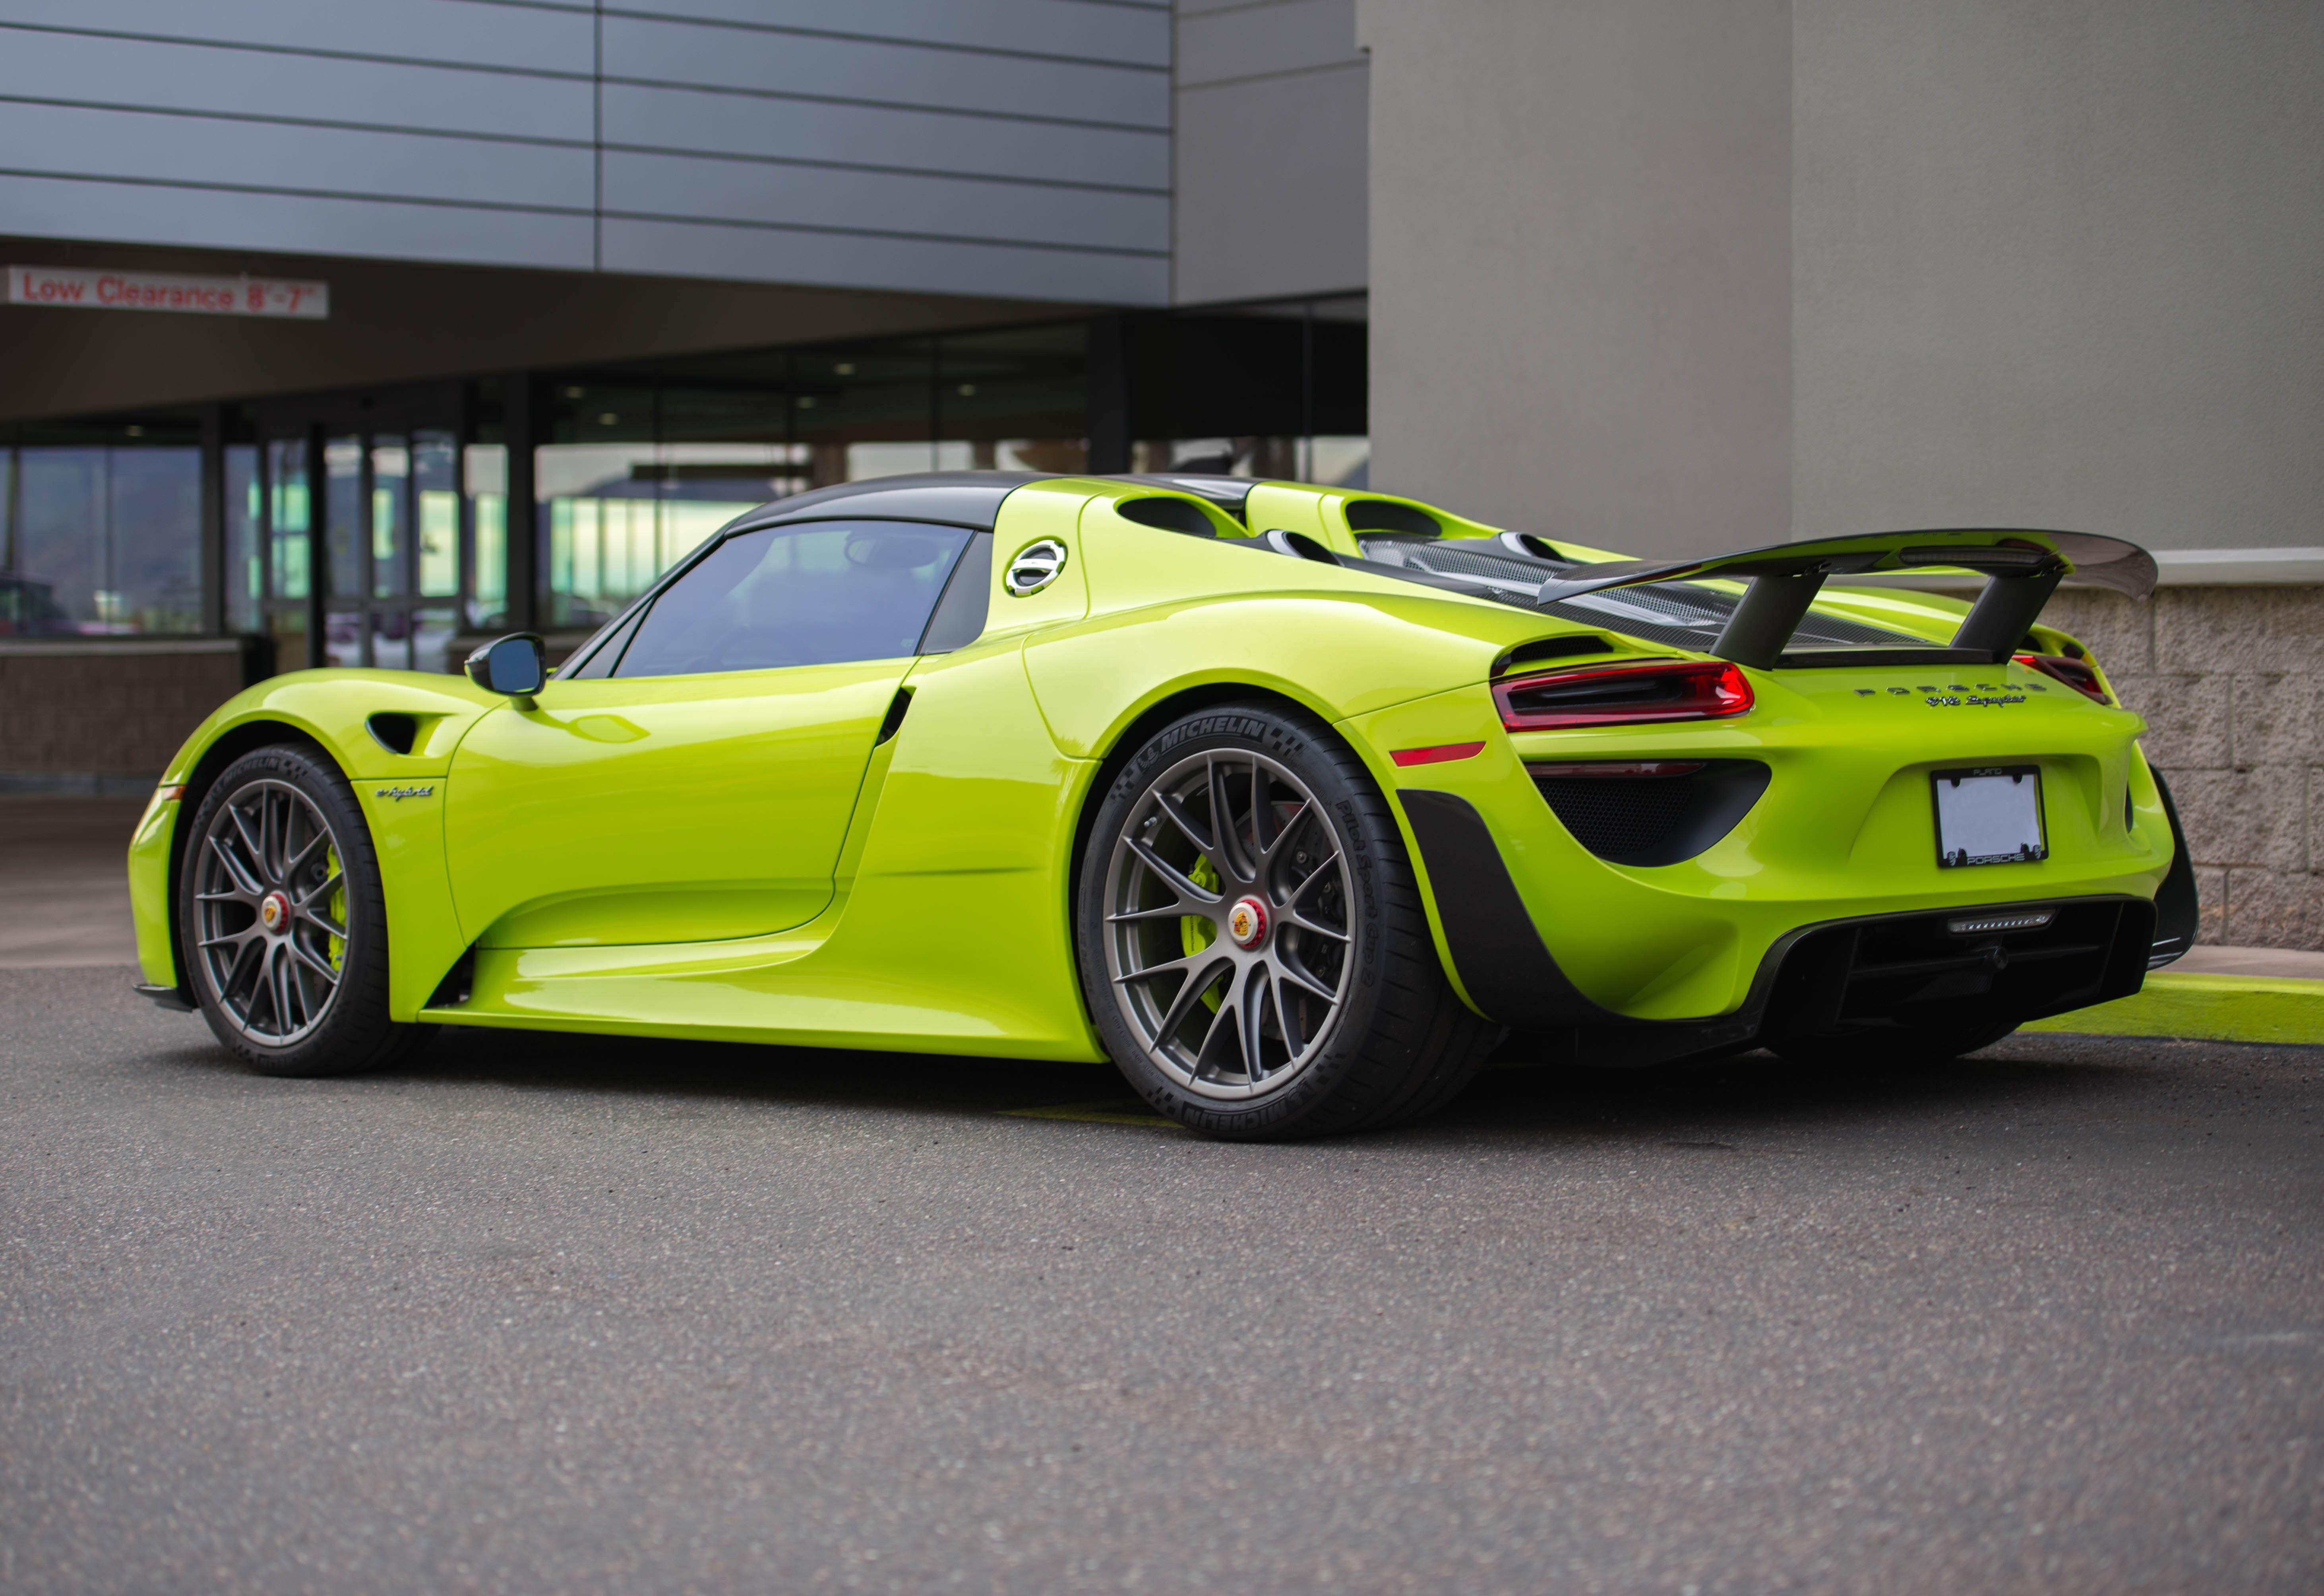 64e9e63944656664f141a4b1093ccef1 Gorgeous Porsche 918 Spyder Acid Green Cars Trend